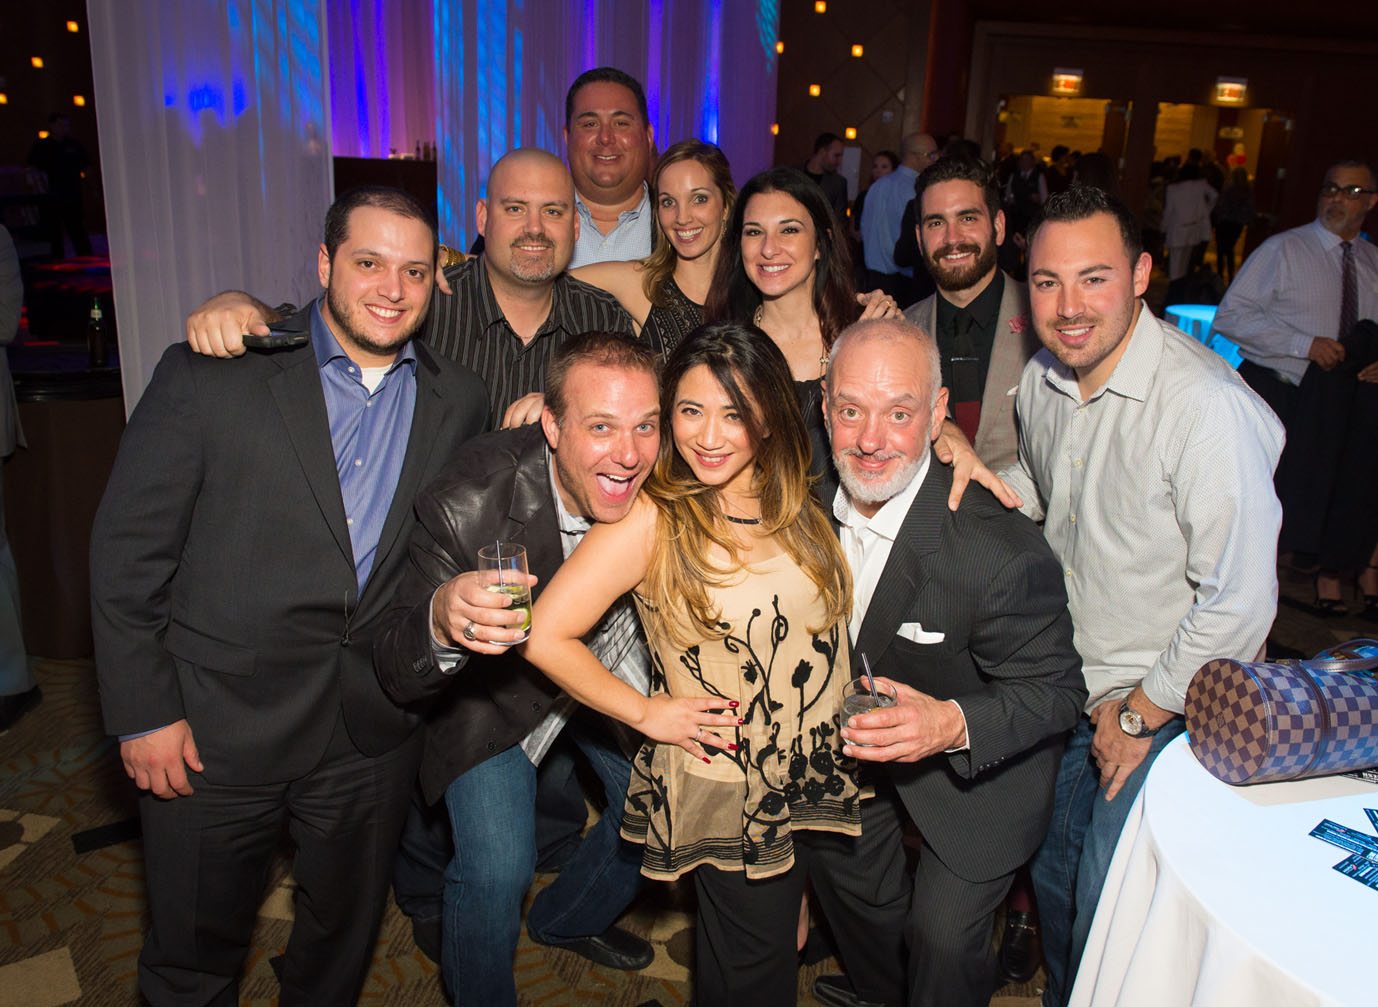 2015-12-09 ReMax Corpoarte Event - The Borgata - Atlantic City NJ - Photo Sesh - 2015-5285.jpg